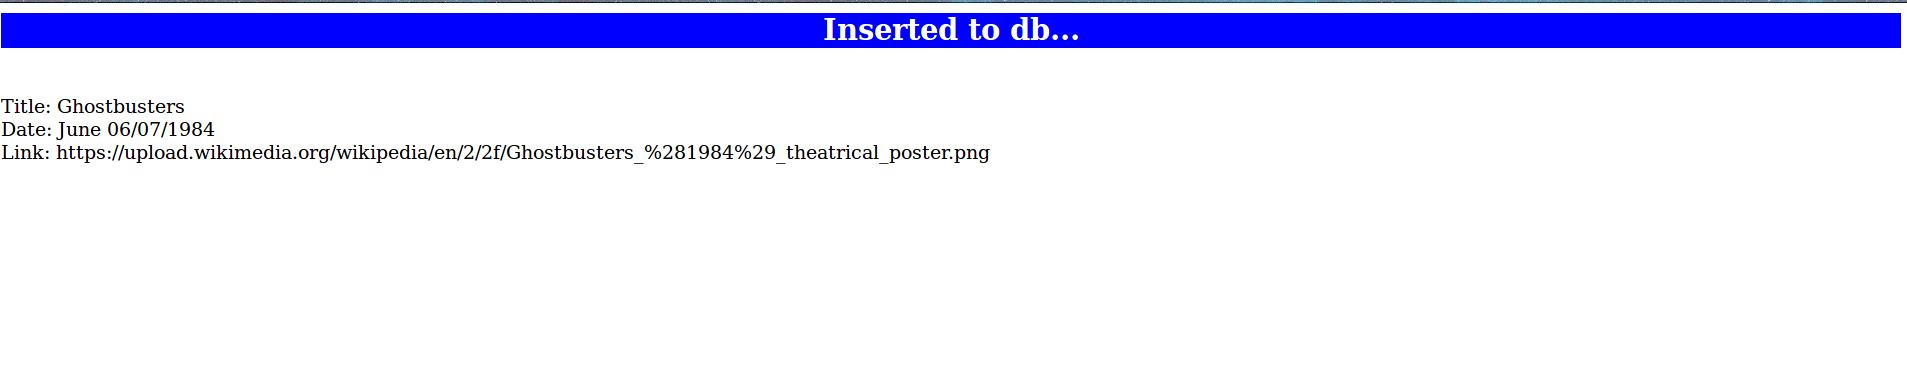 db insert